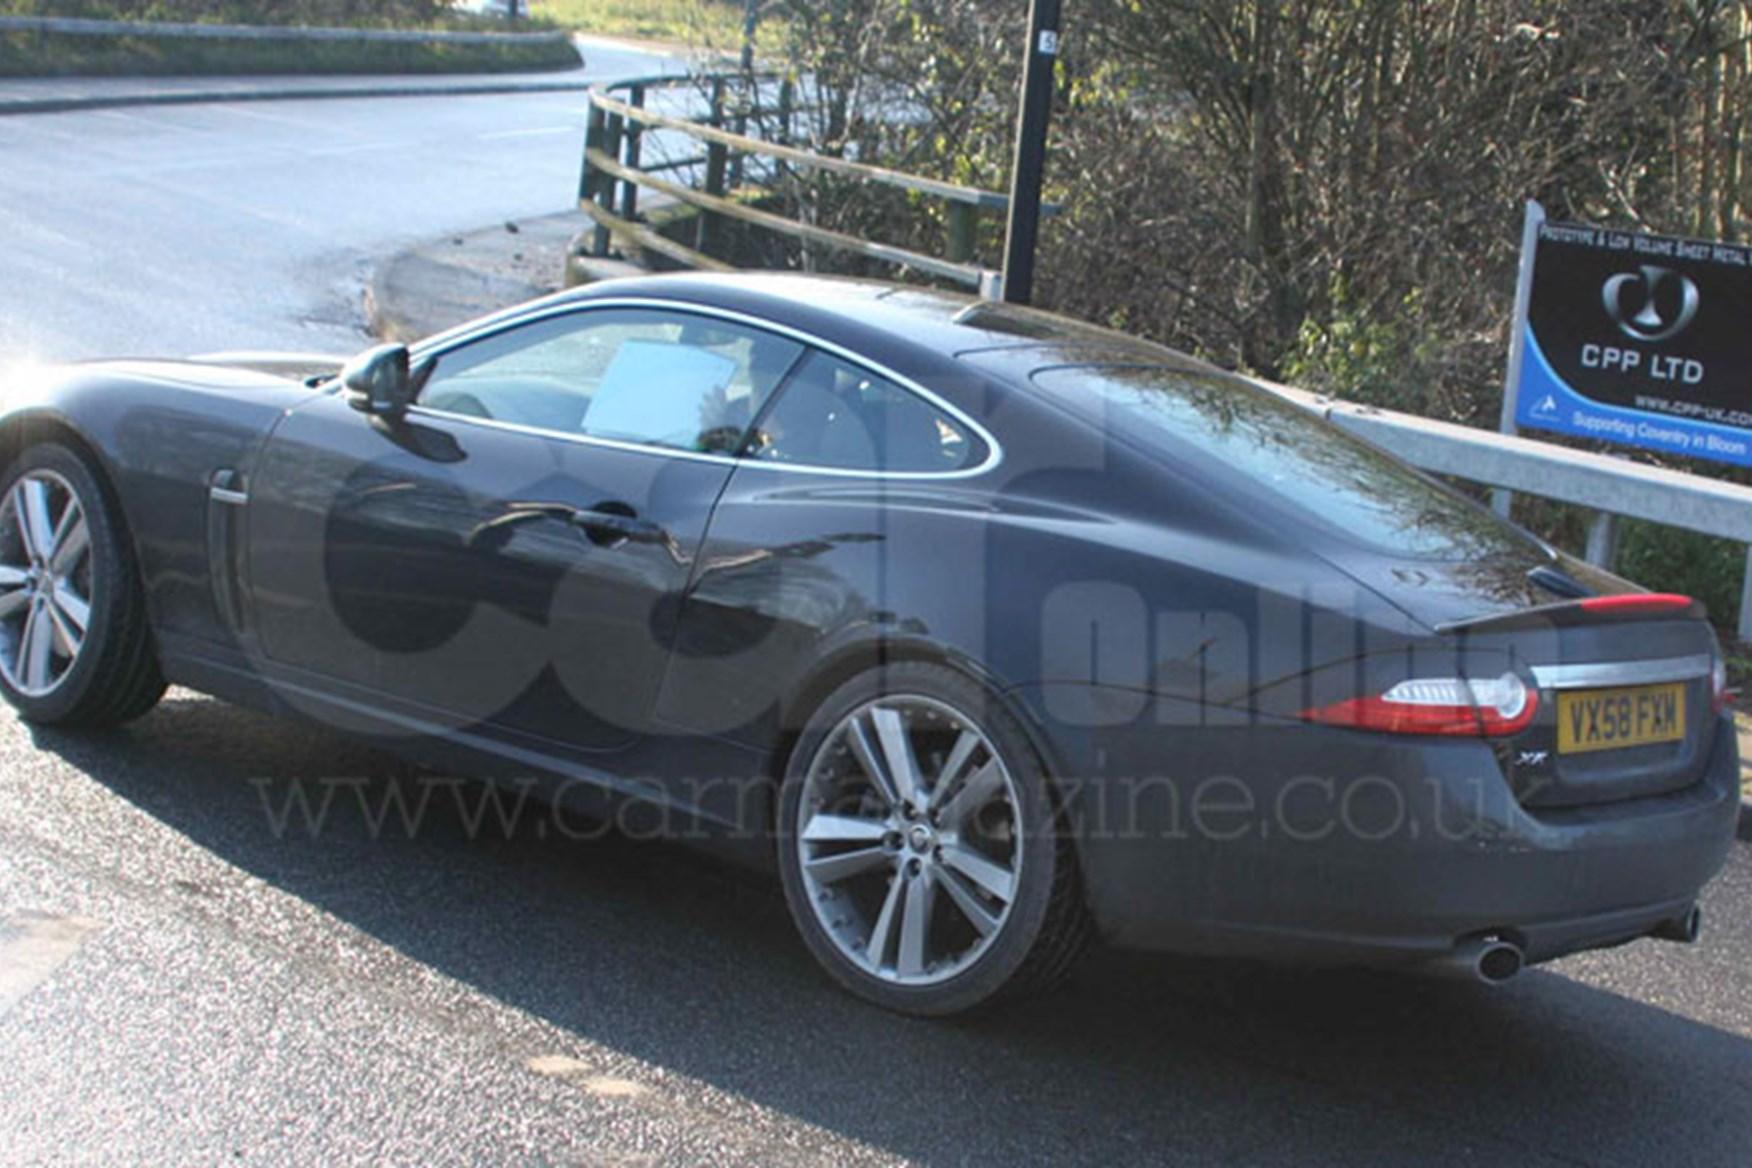 ... Jaguar XK (2009) Exterior Spy Photos